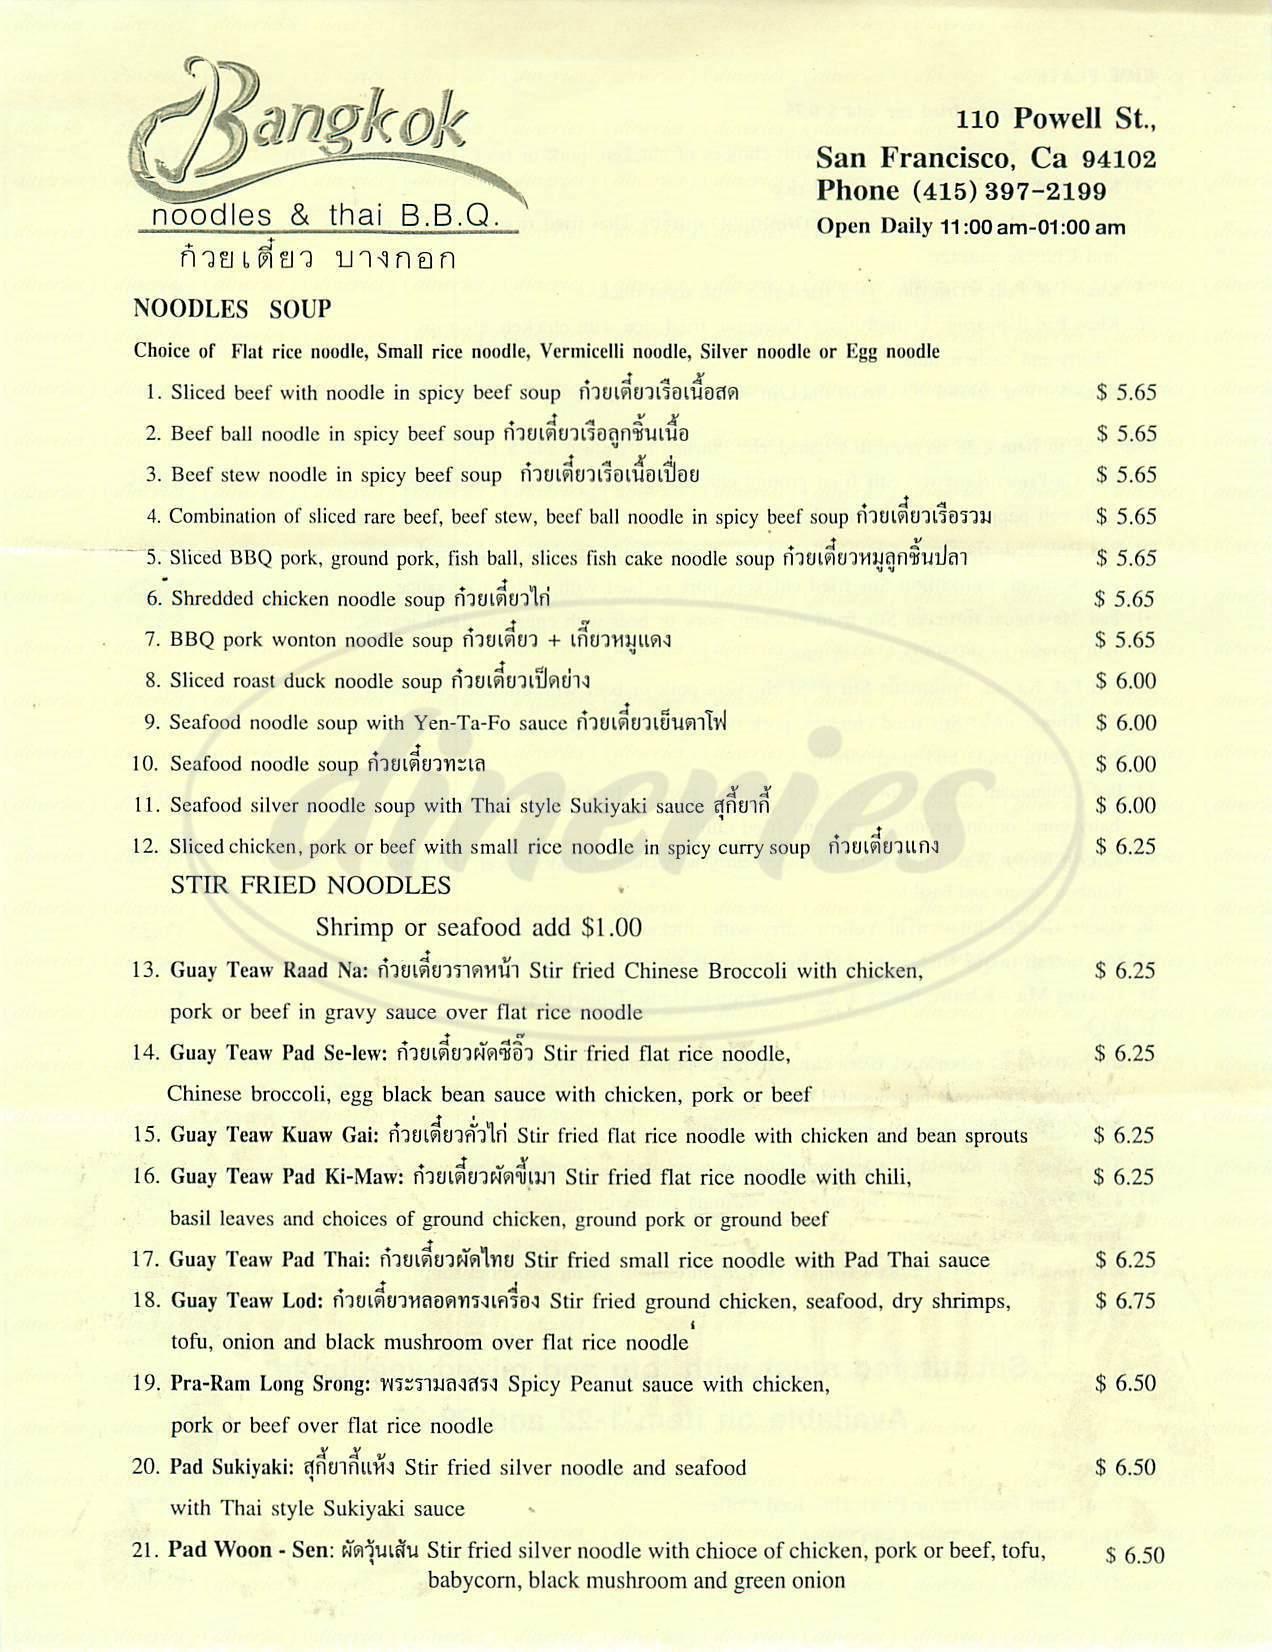 menu for Bangkok Noodles